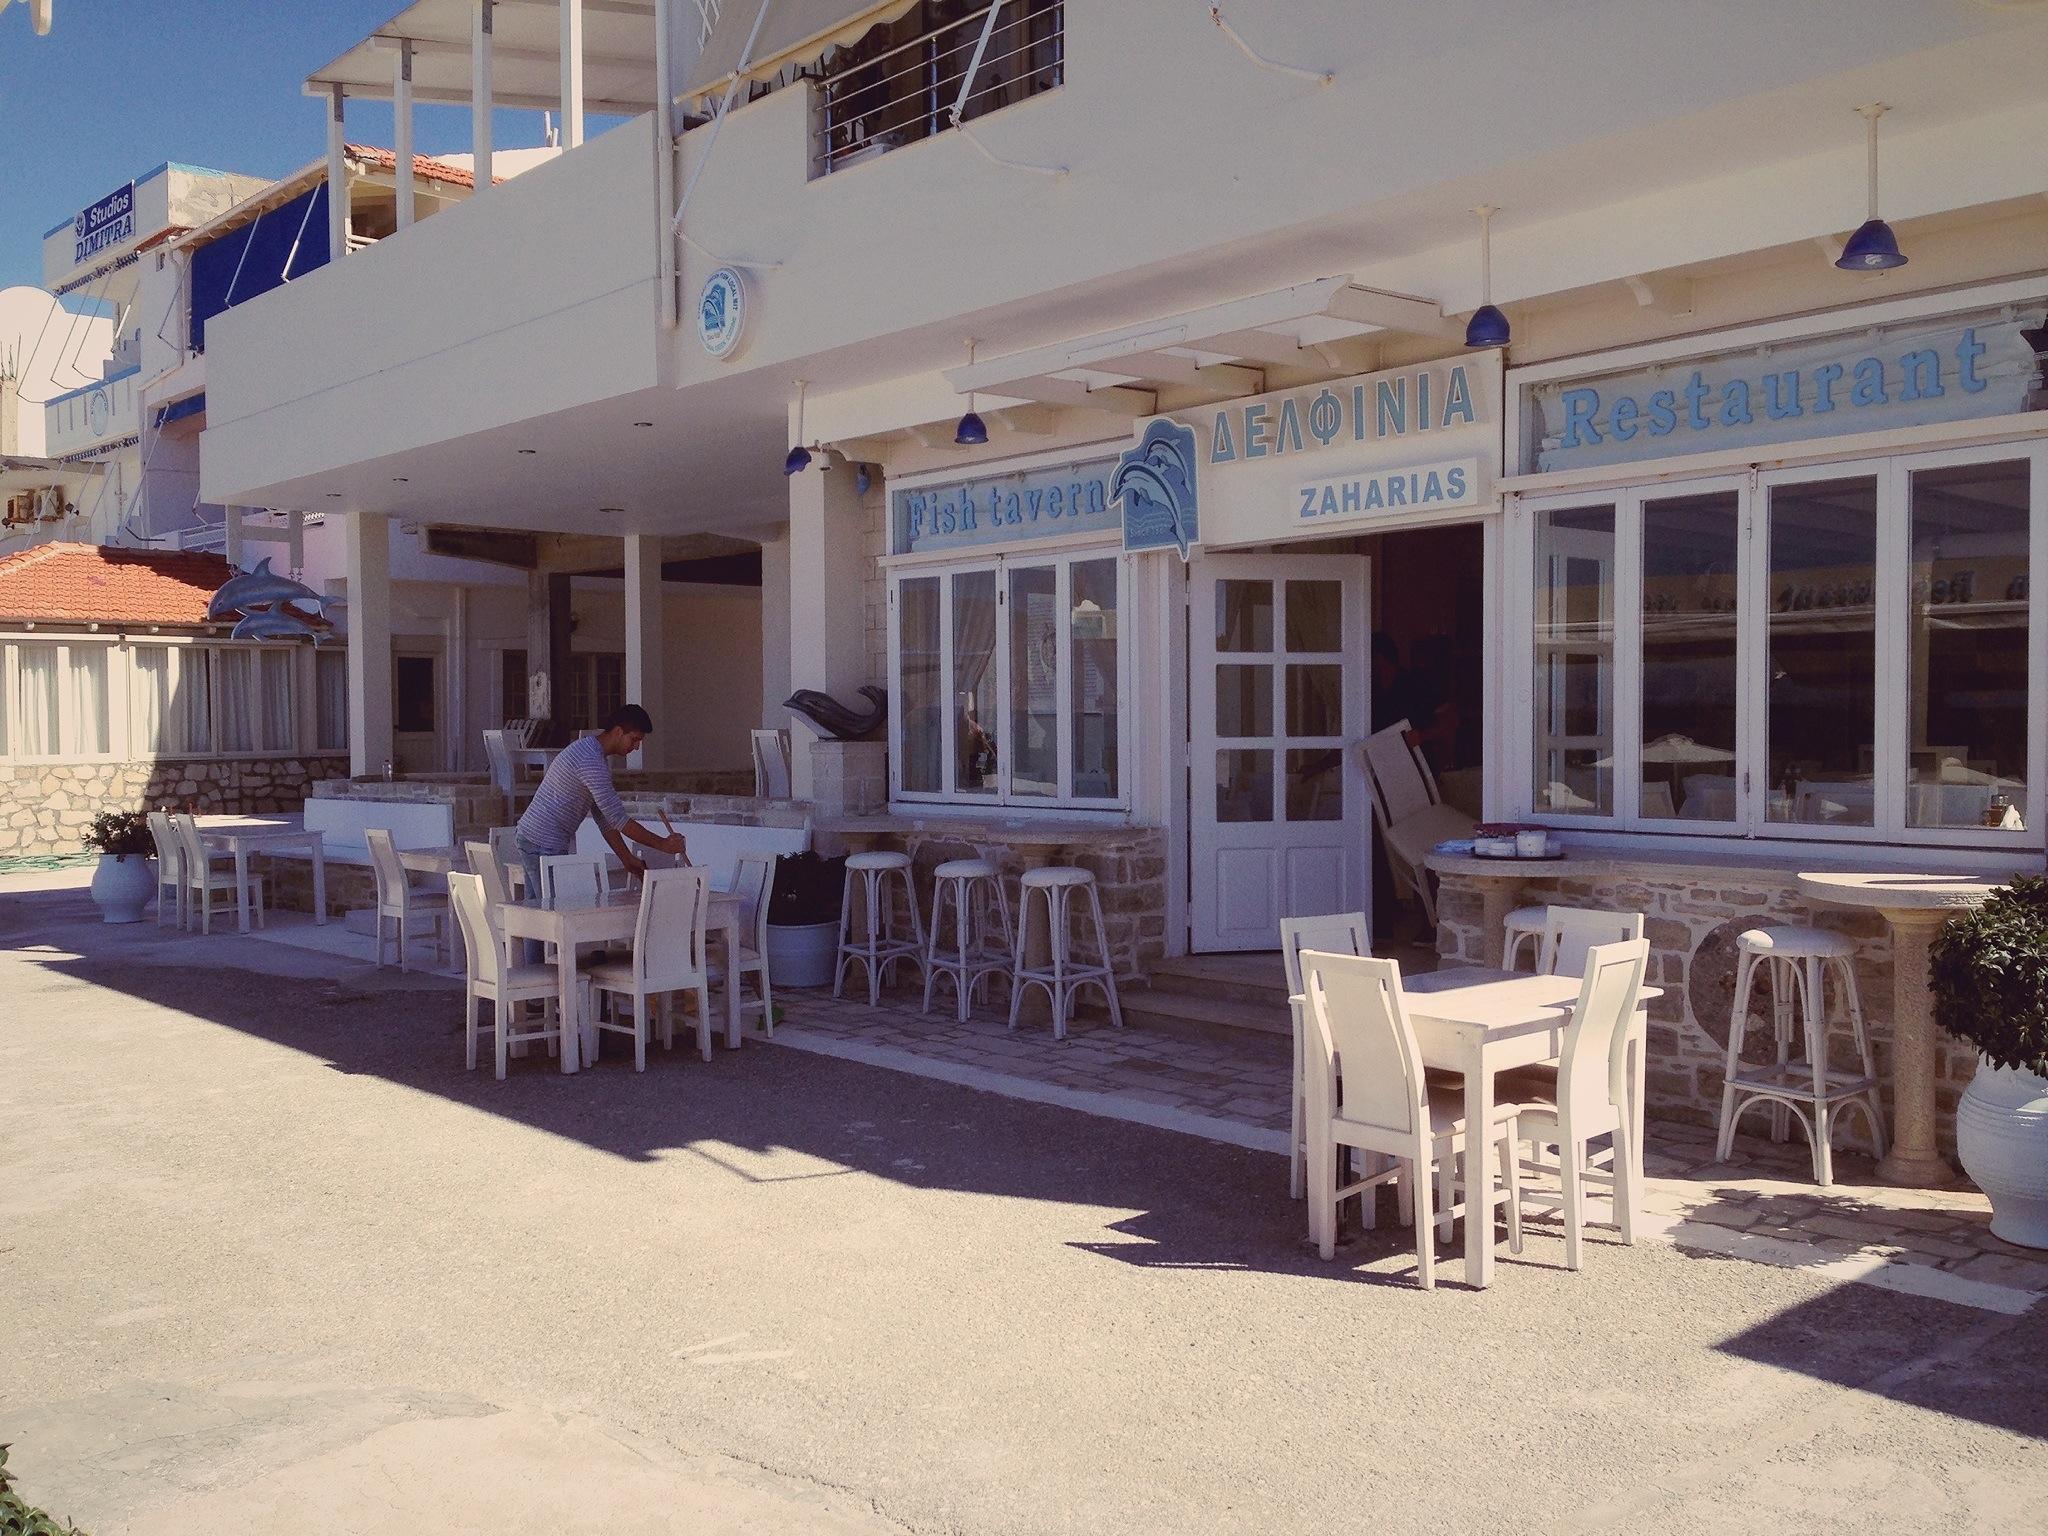 Crete, Greece Food Guide: 10 Greek food Must-Eat Restaurants & Street Food Stalls in Kalamaki